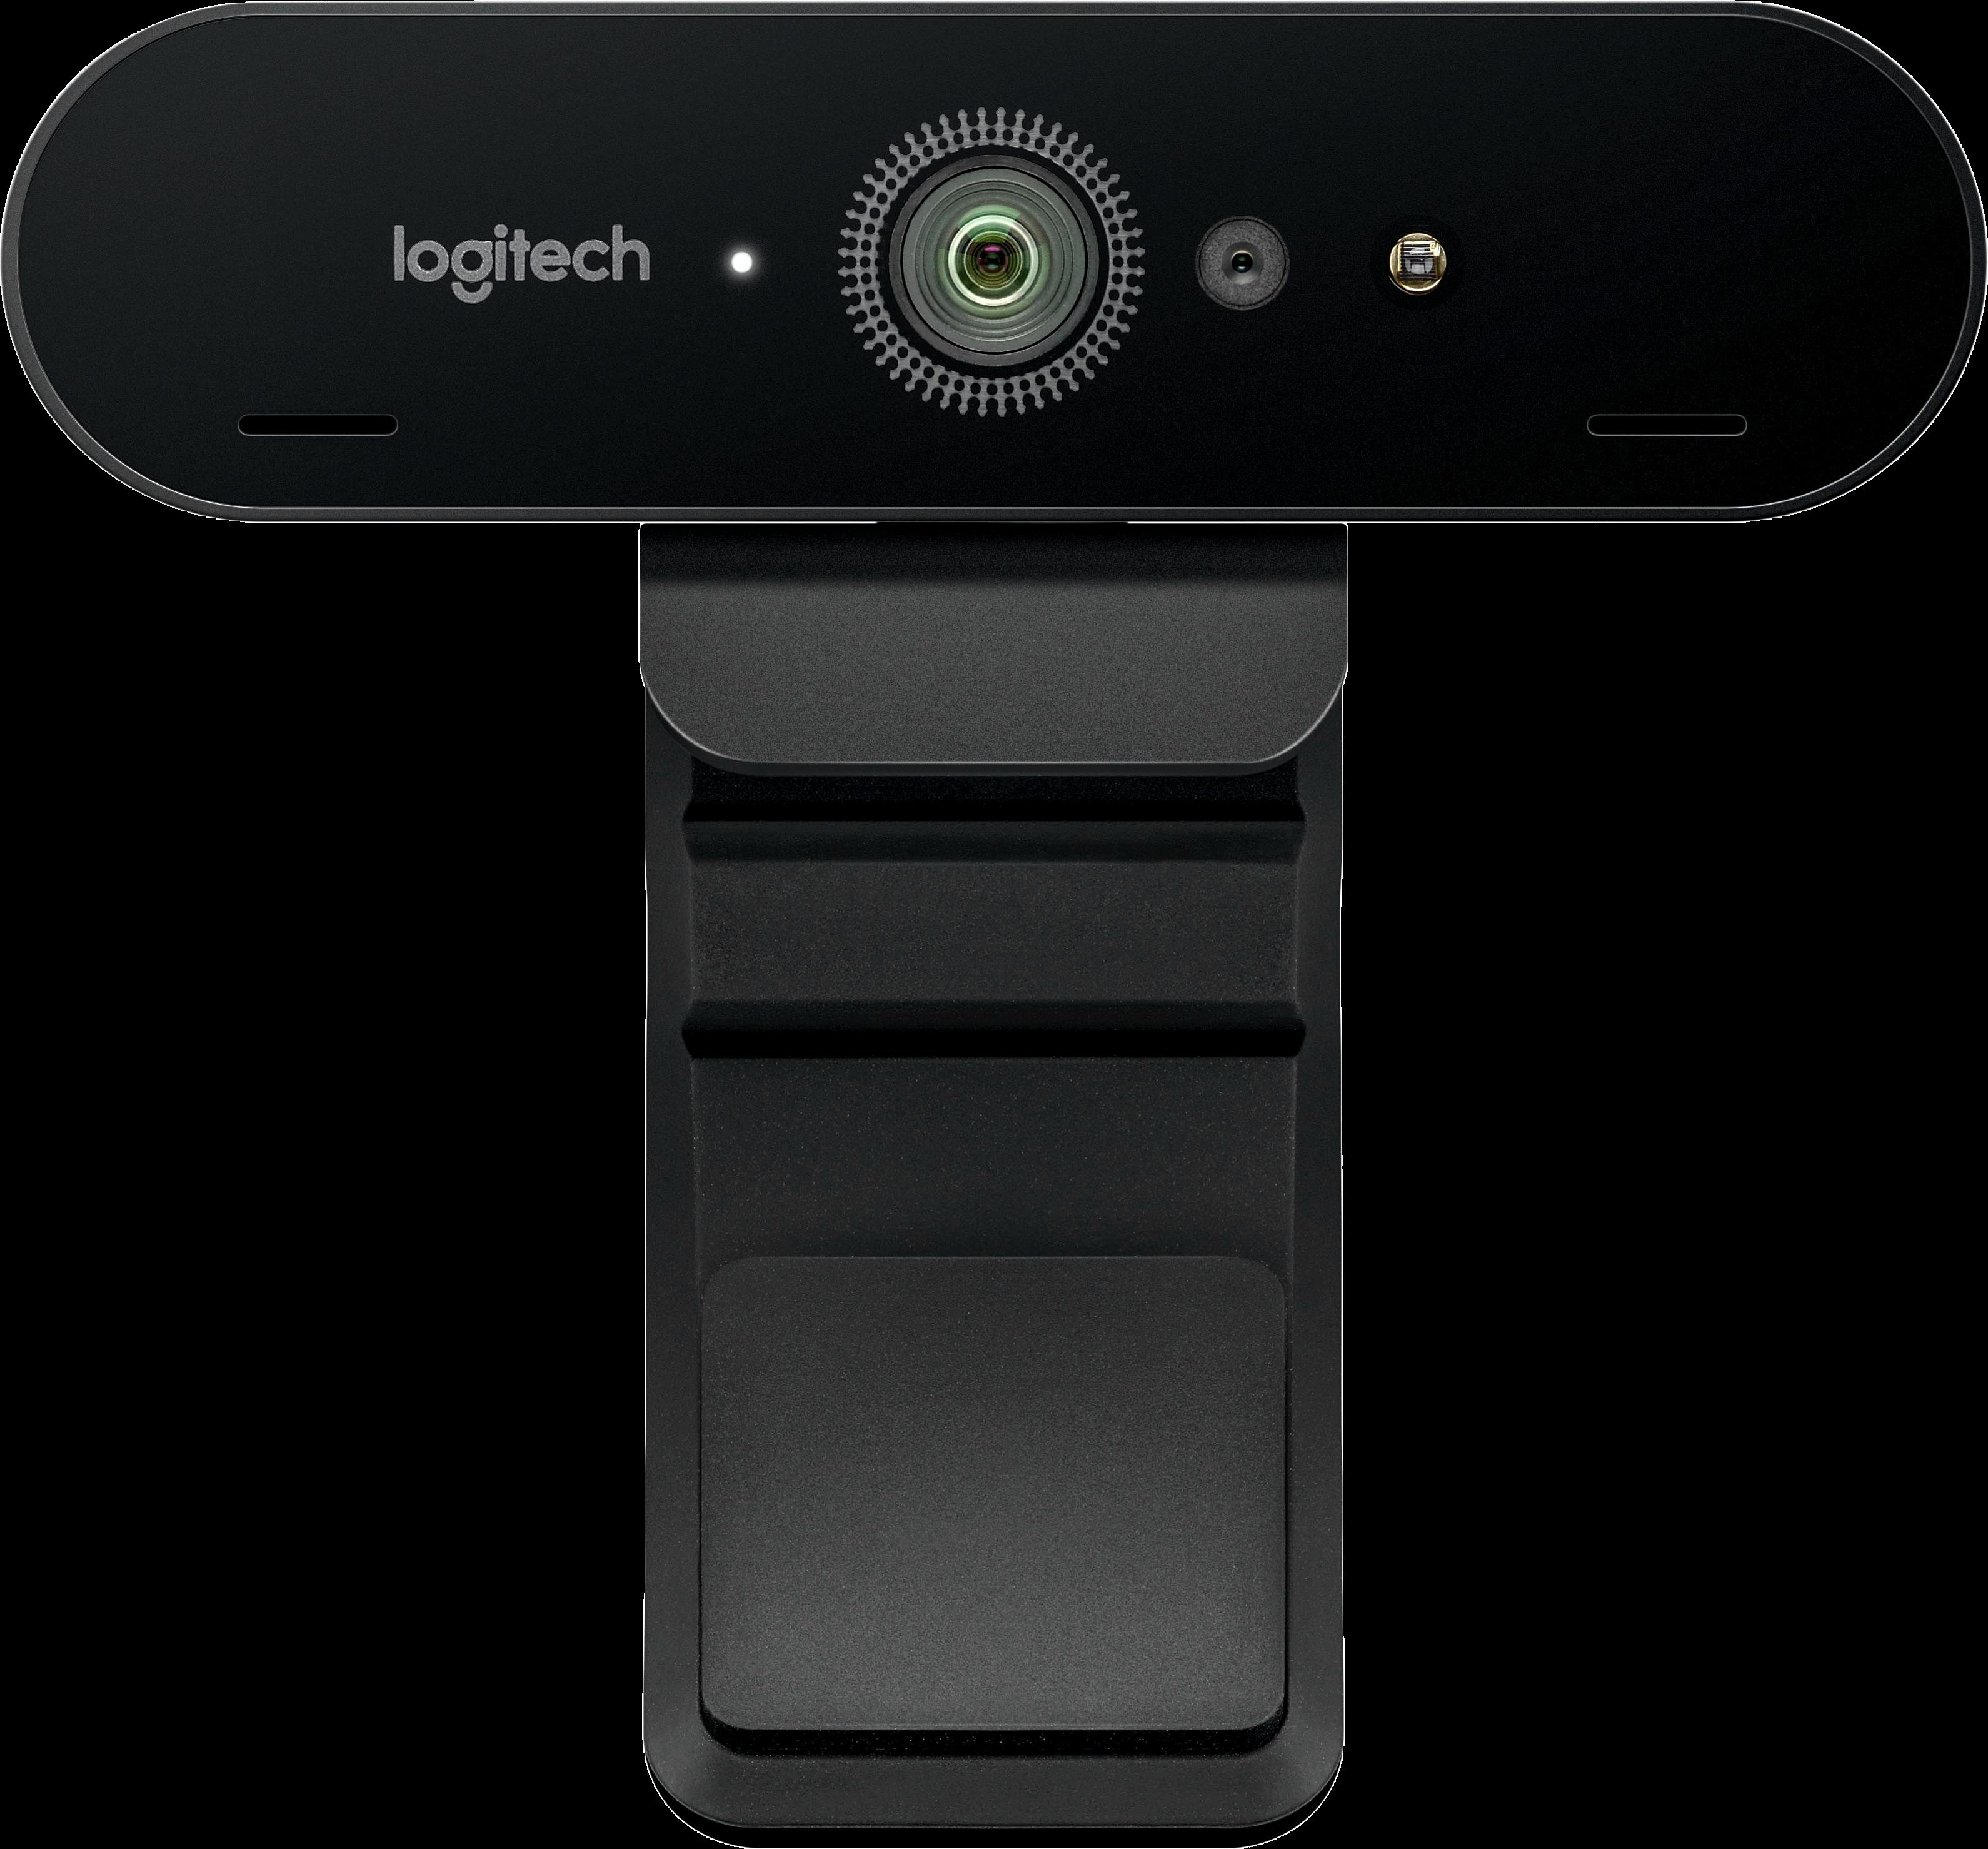 Logitech 4K Pro